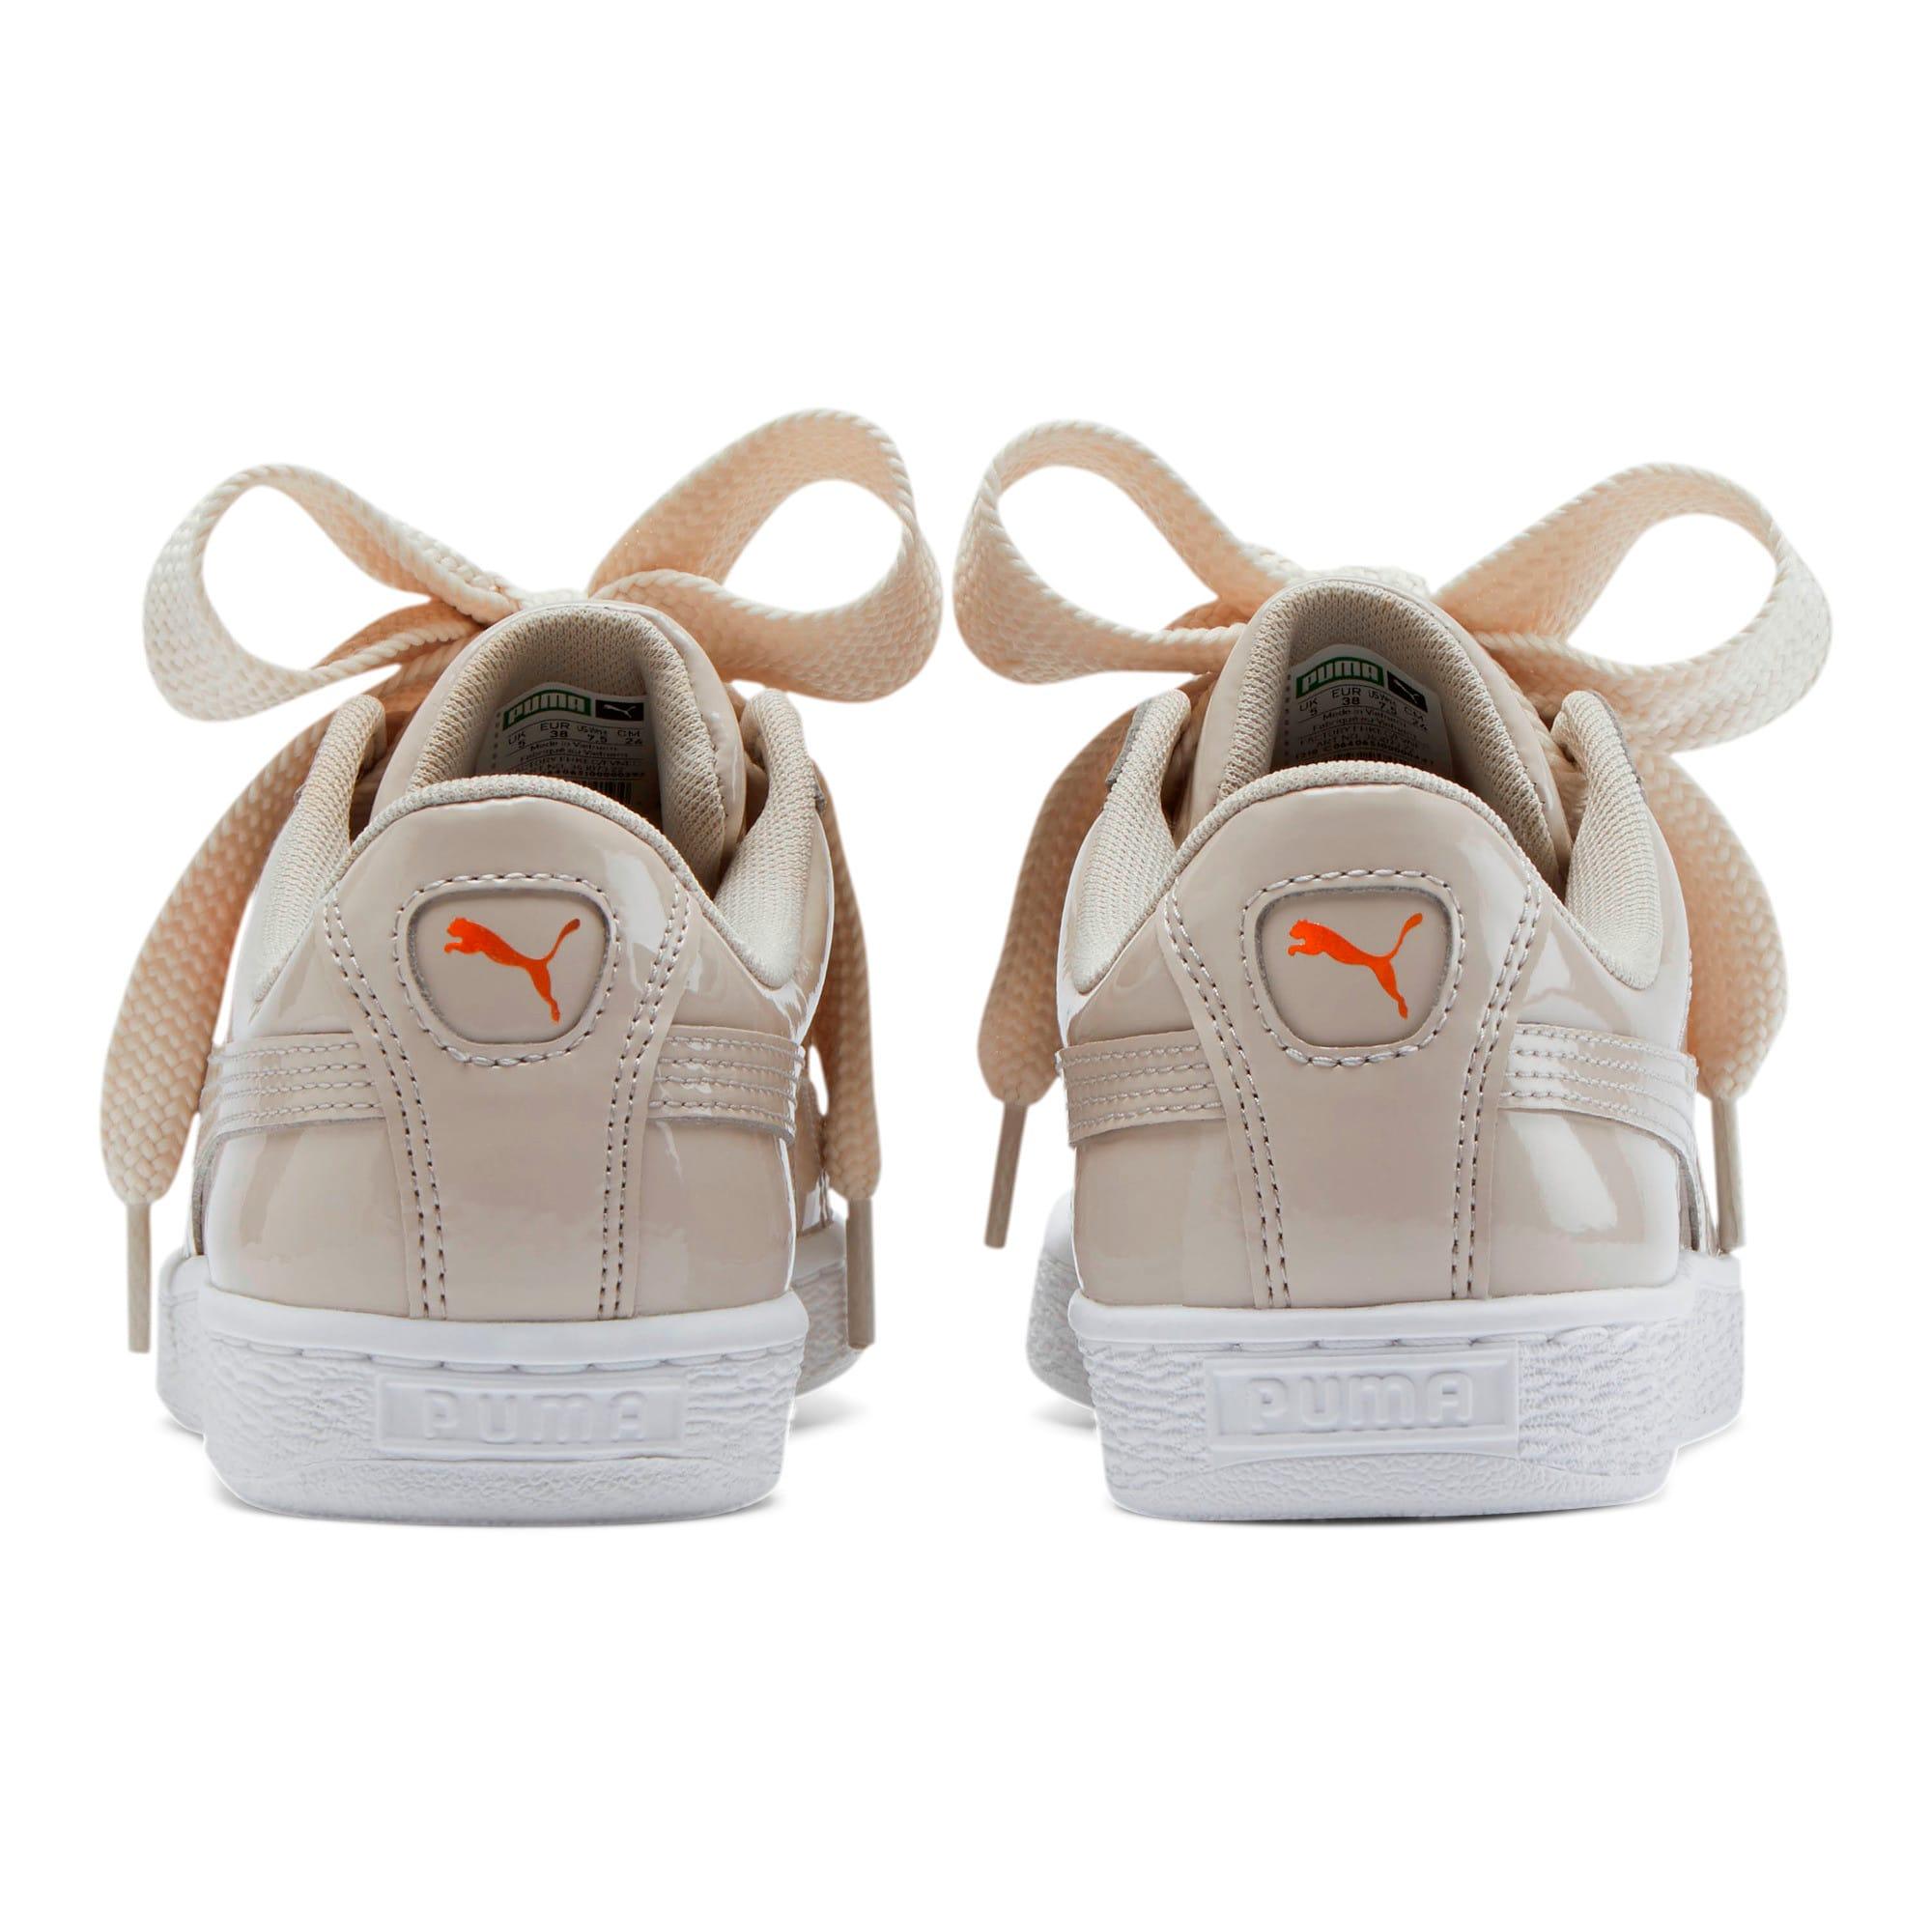 Thumbnail 3 of Basket Heart Patent Women's Sneakers, Silver Gray-Silver Gray, medium